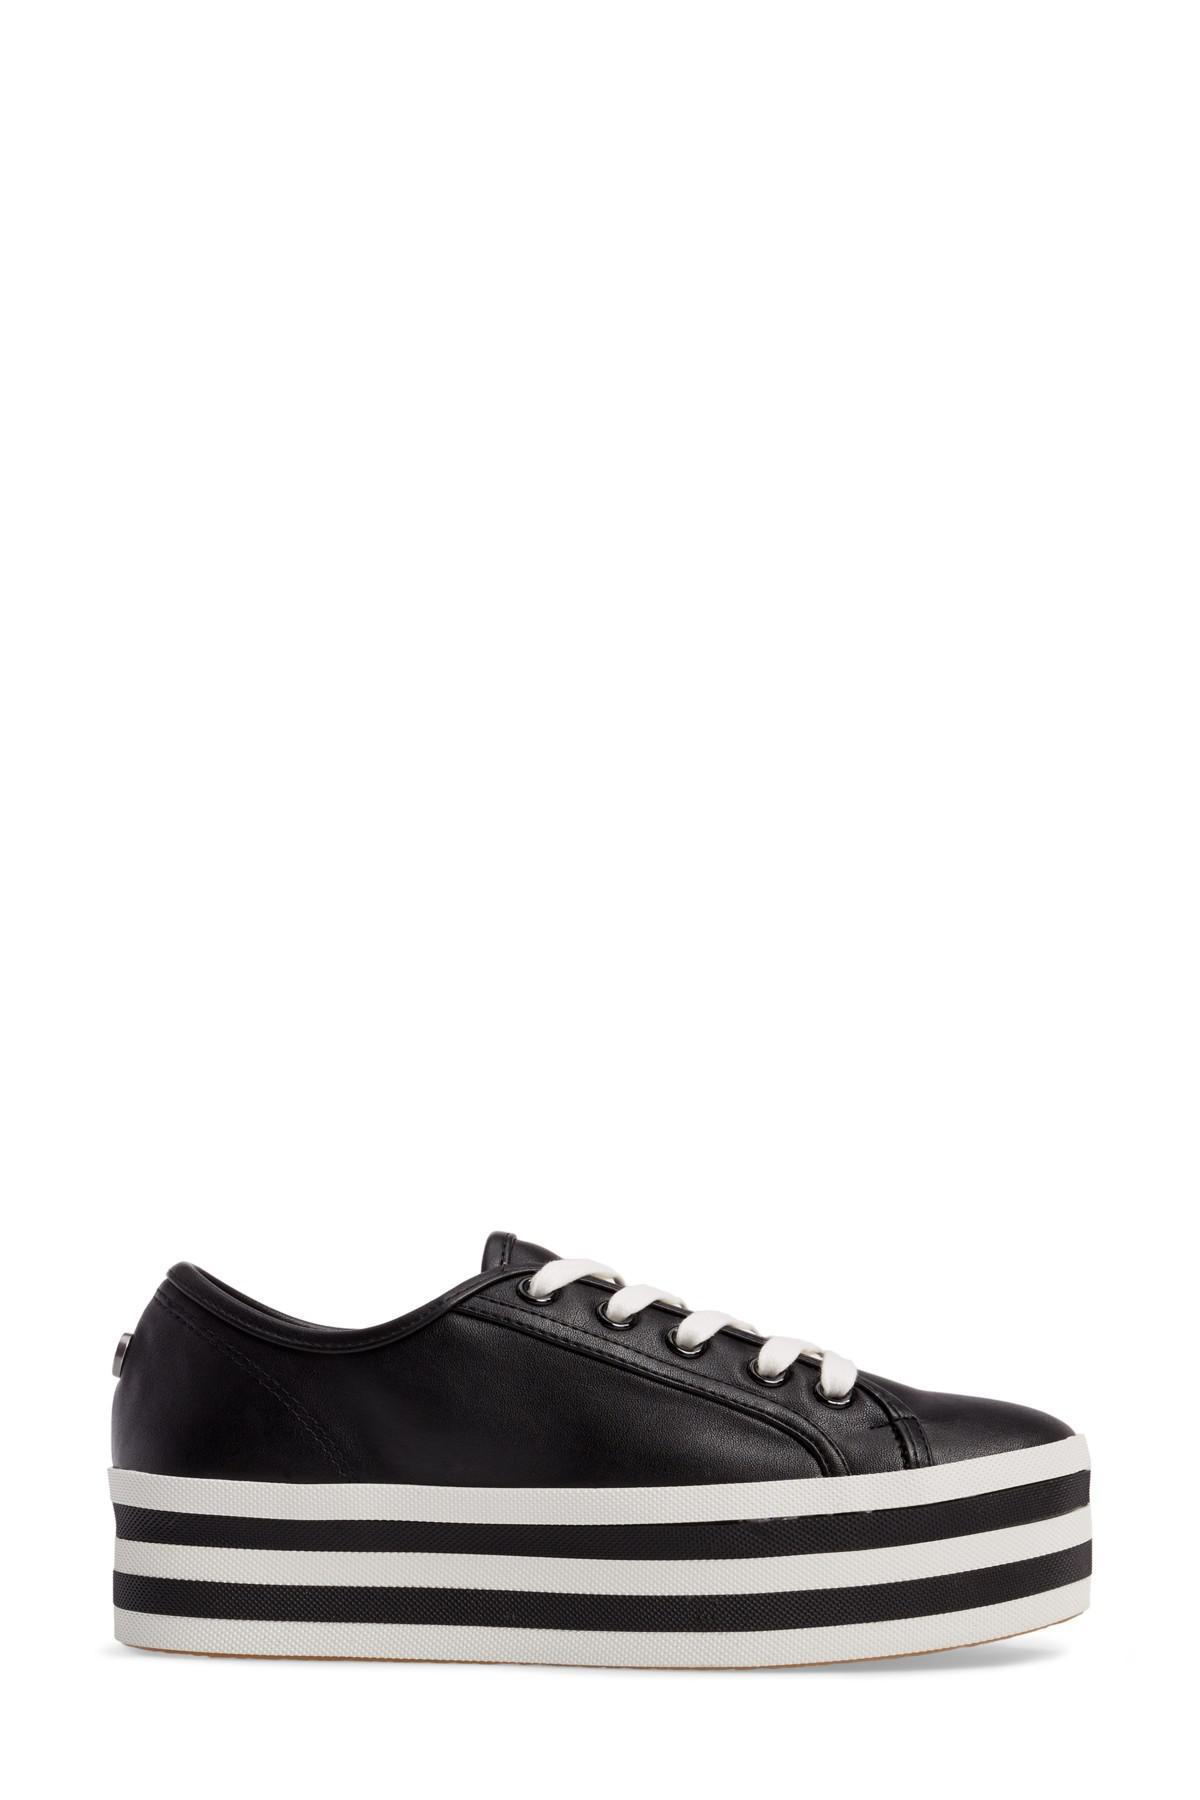 f566b9b4168 Lyst - Steve Madden Rainbow Stacked Platform Sneaker in Black